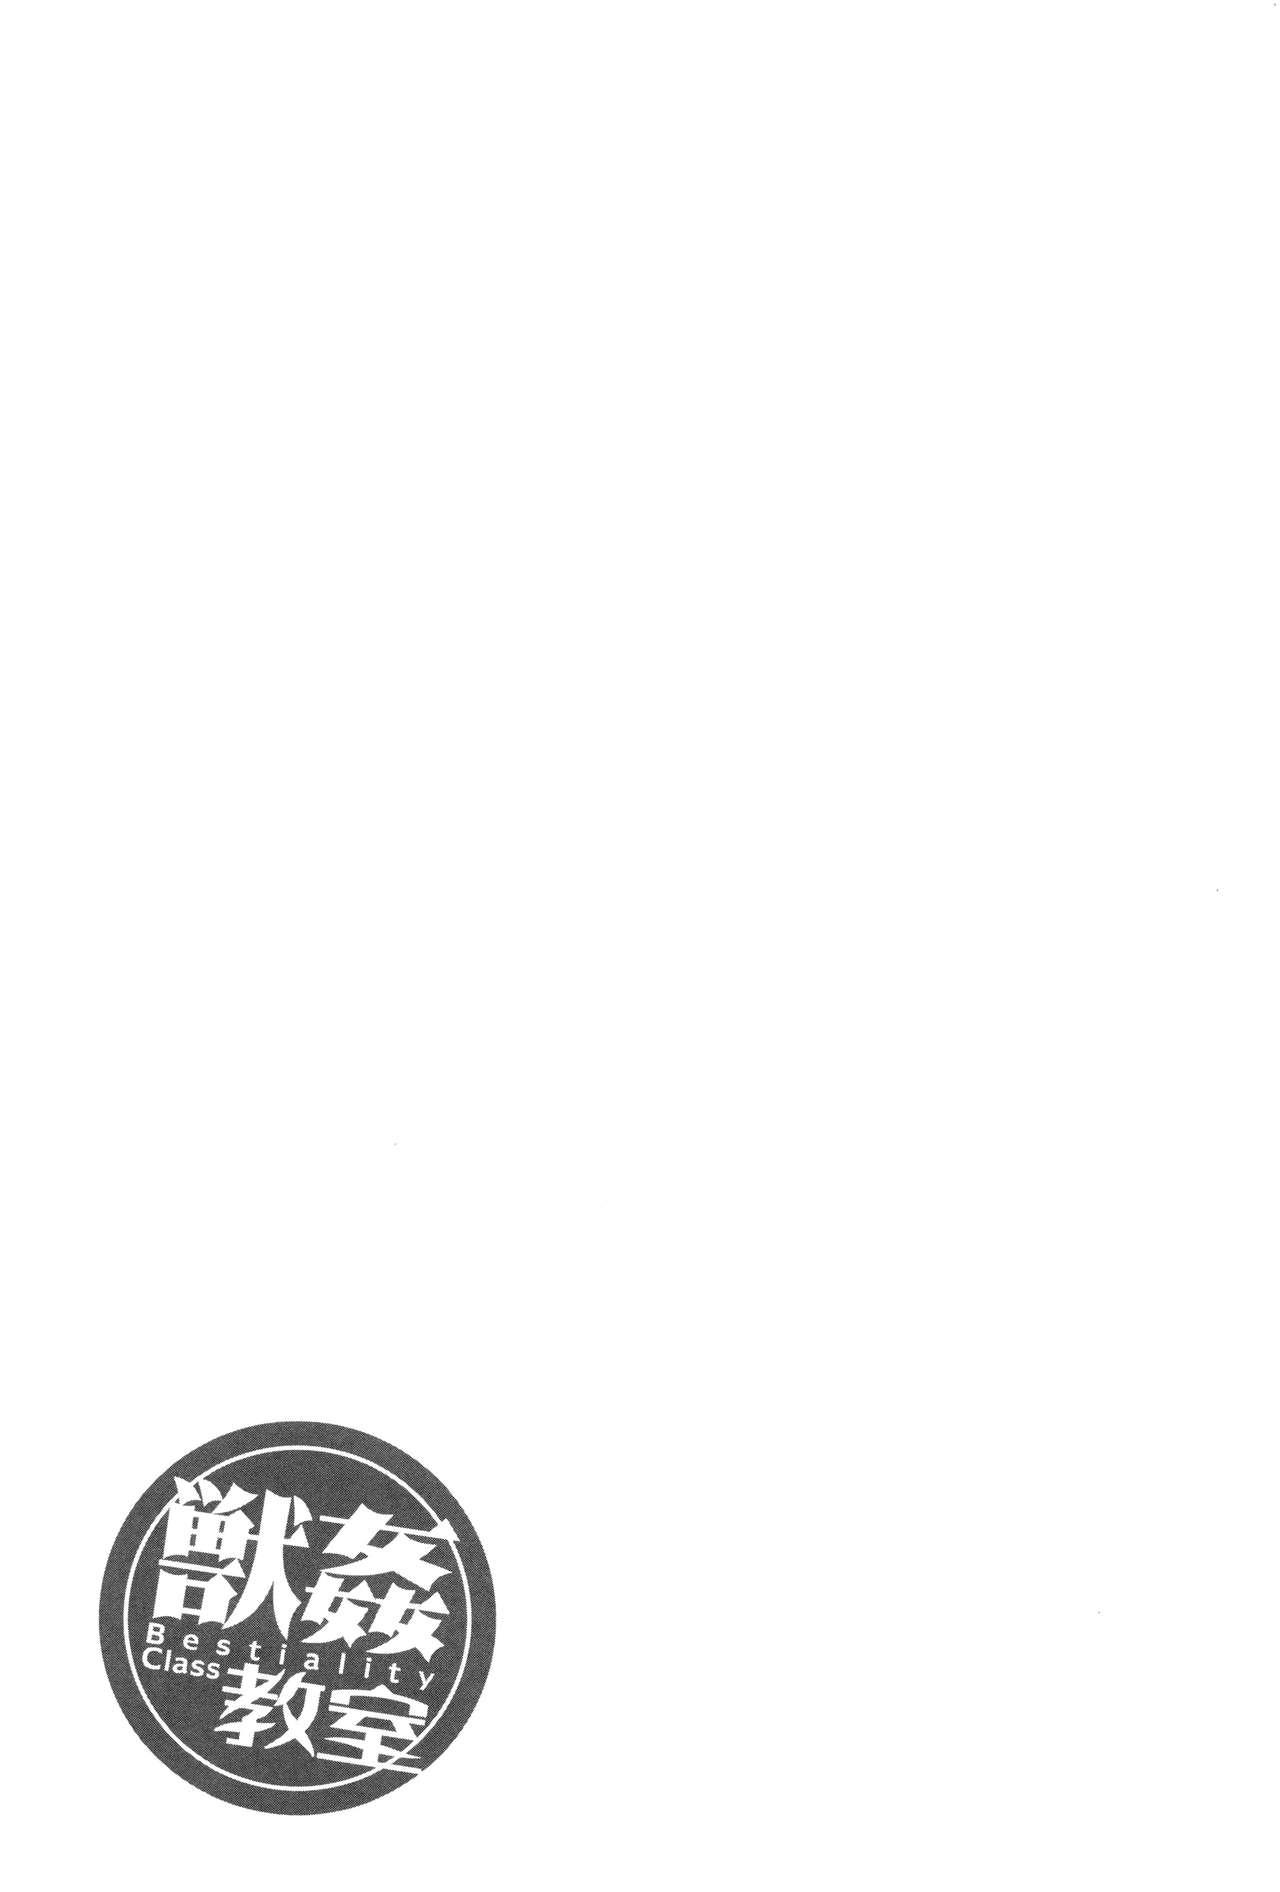 Juukan Kyoushitsu - Bestiality Class 201